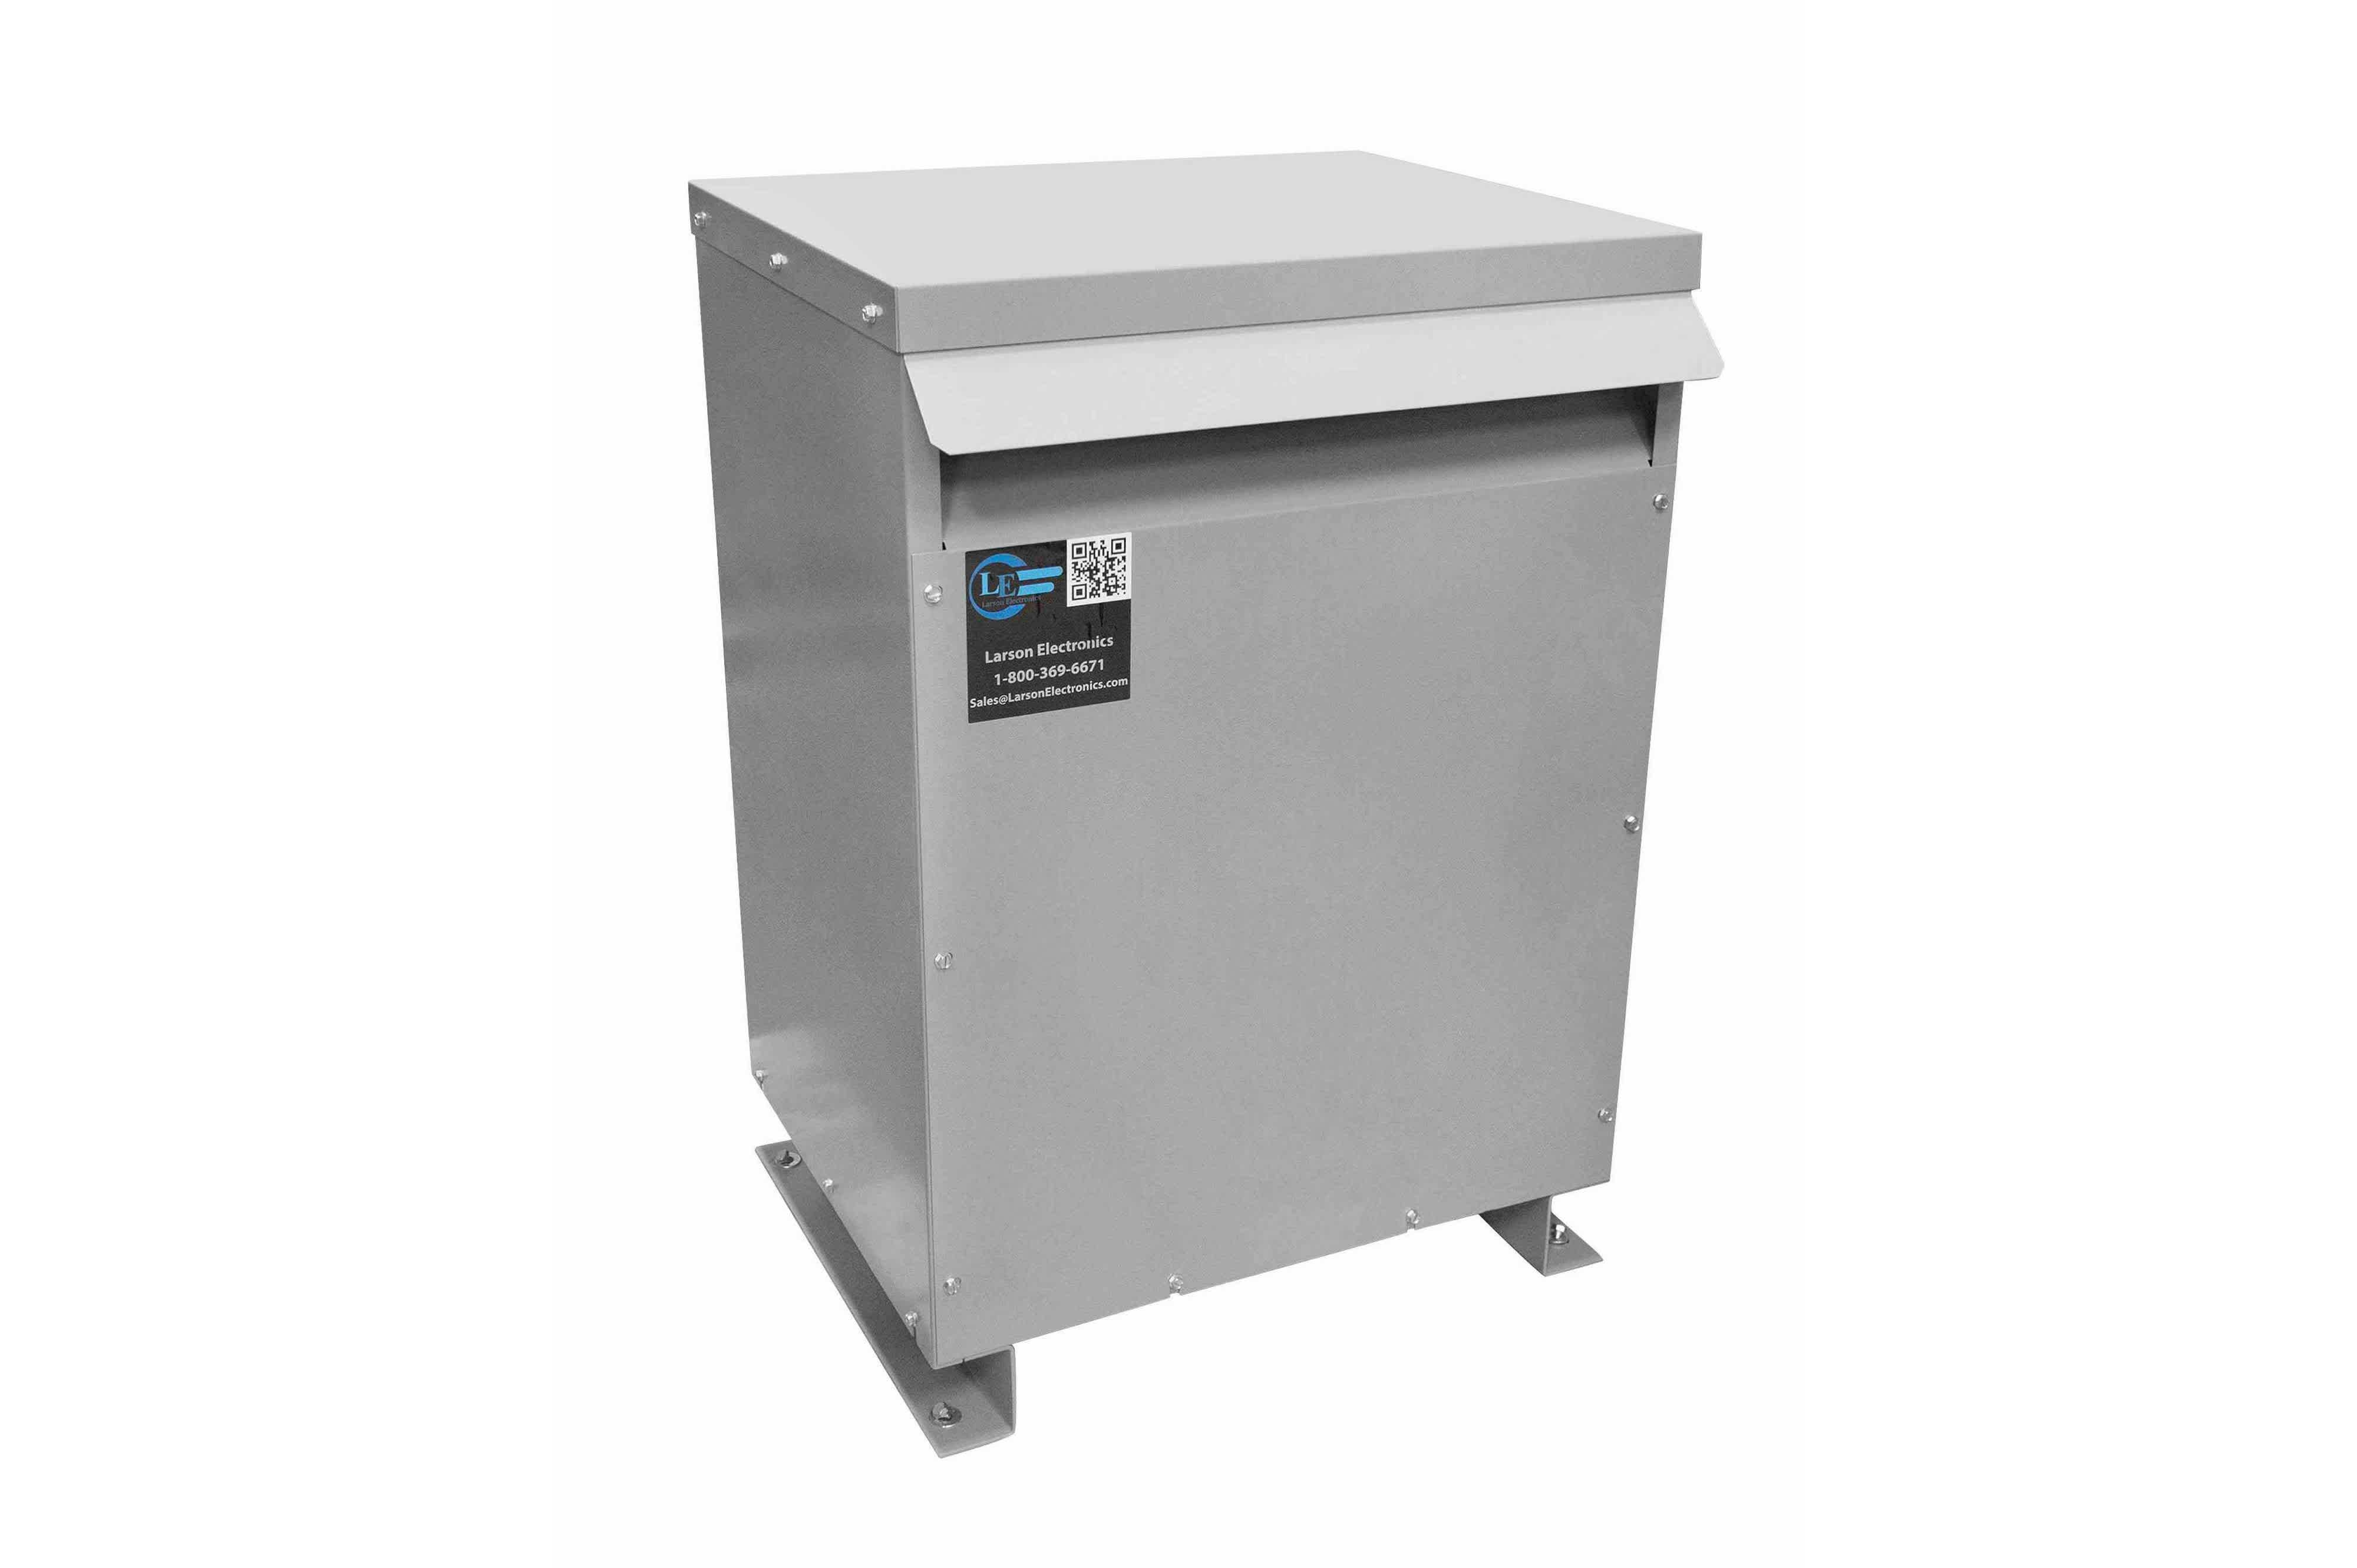 200 kVA 3PH Isolation Transformer, 208V Wye Primary, 480V Delta Secondary, N3R, Ventilated, 60 Hz